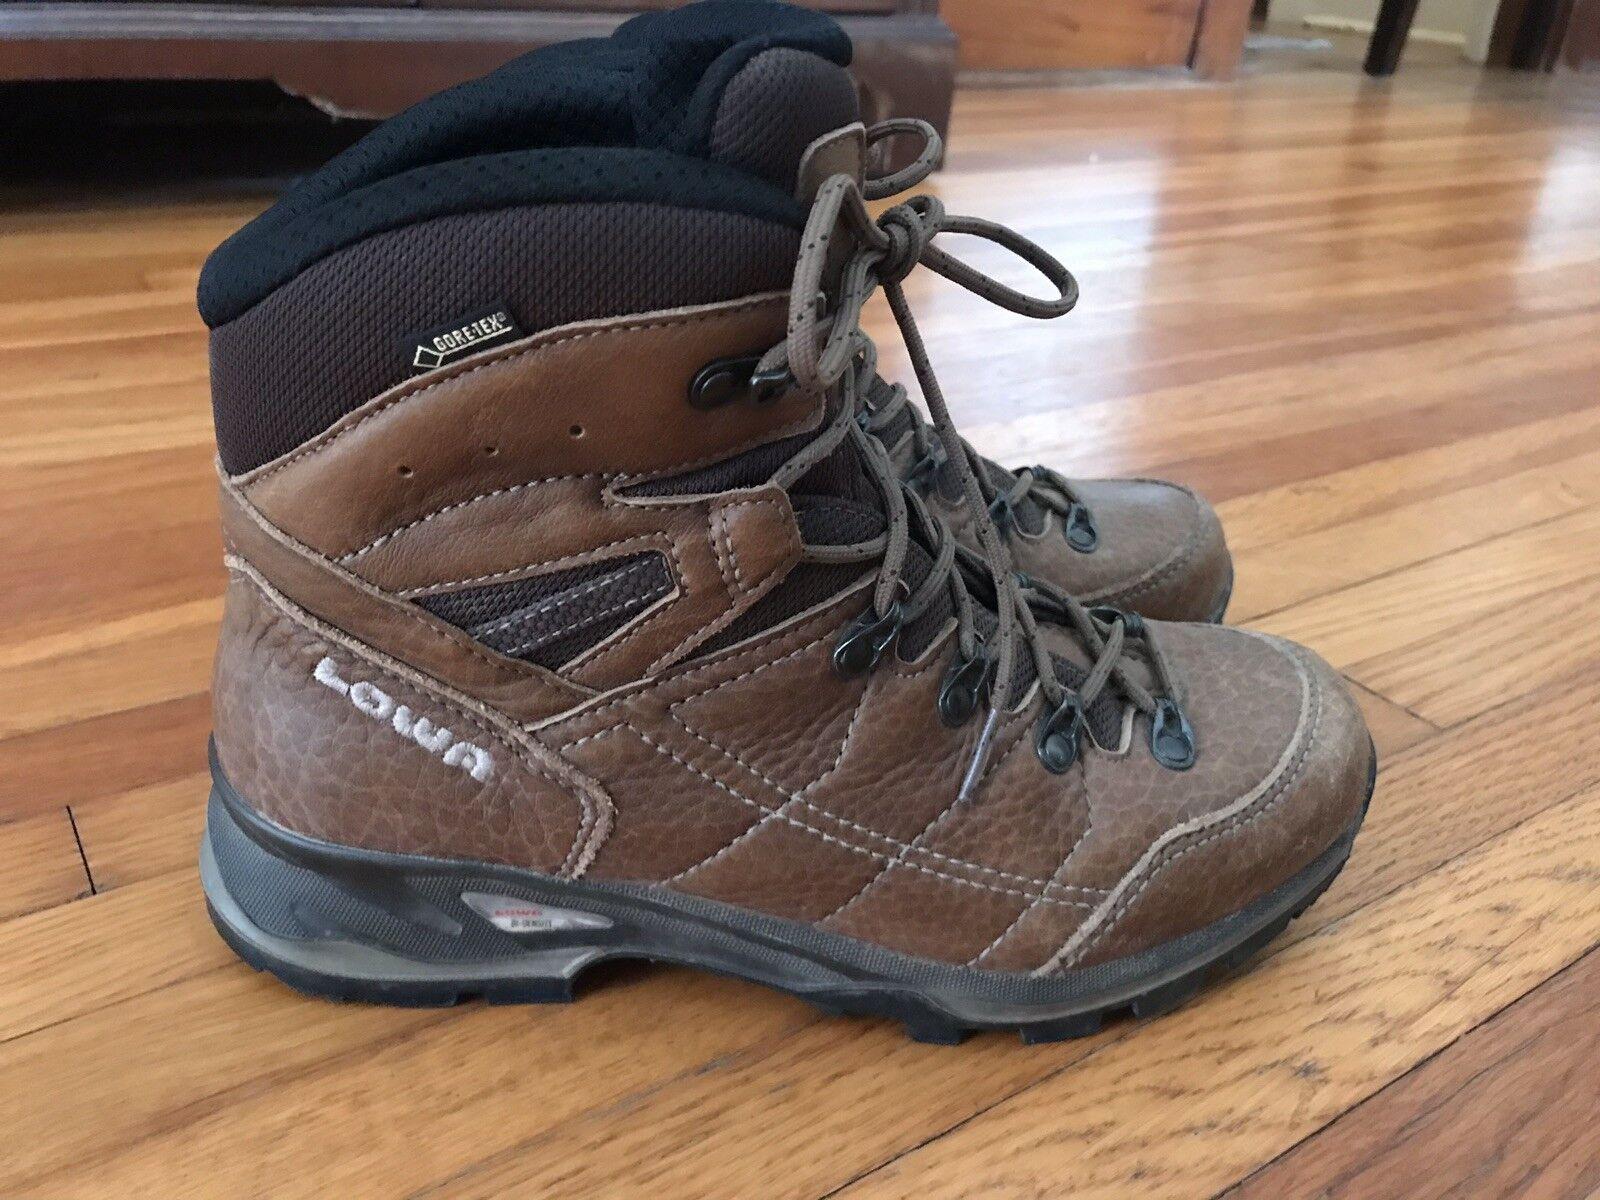 Lowa Hudson Goretex Womens Hiking Trekking Boots Full Grain Leather Size 7.5 US